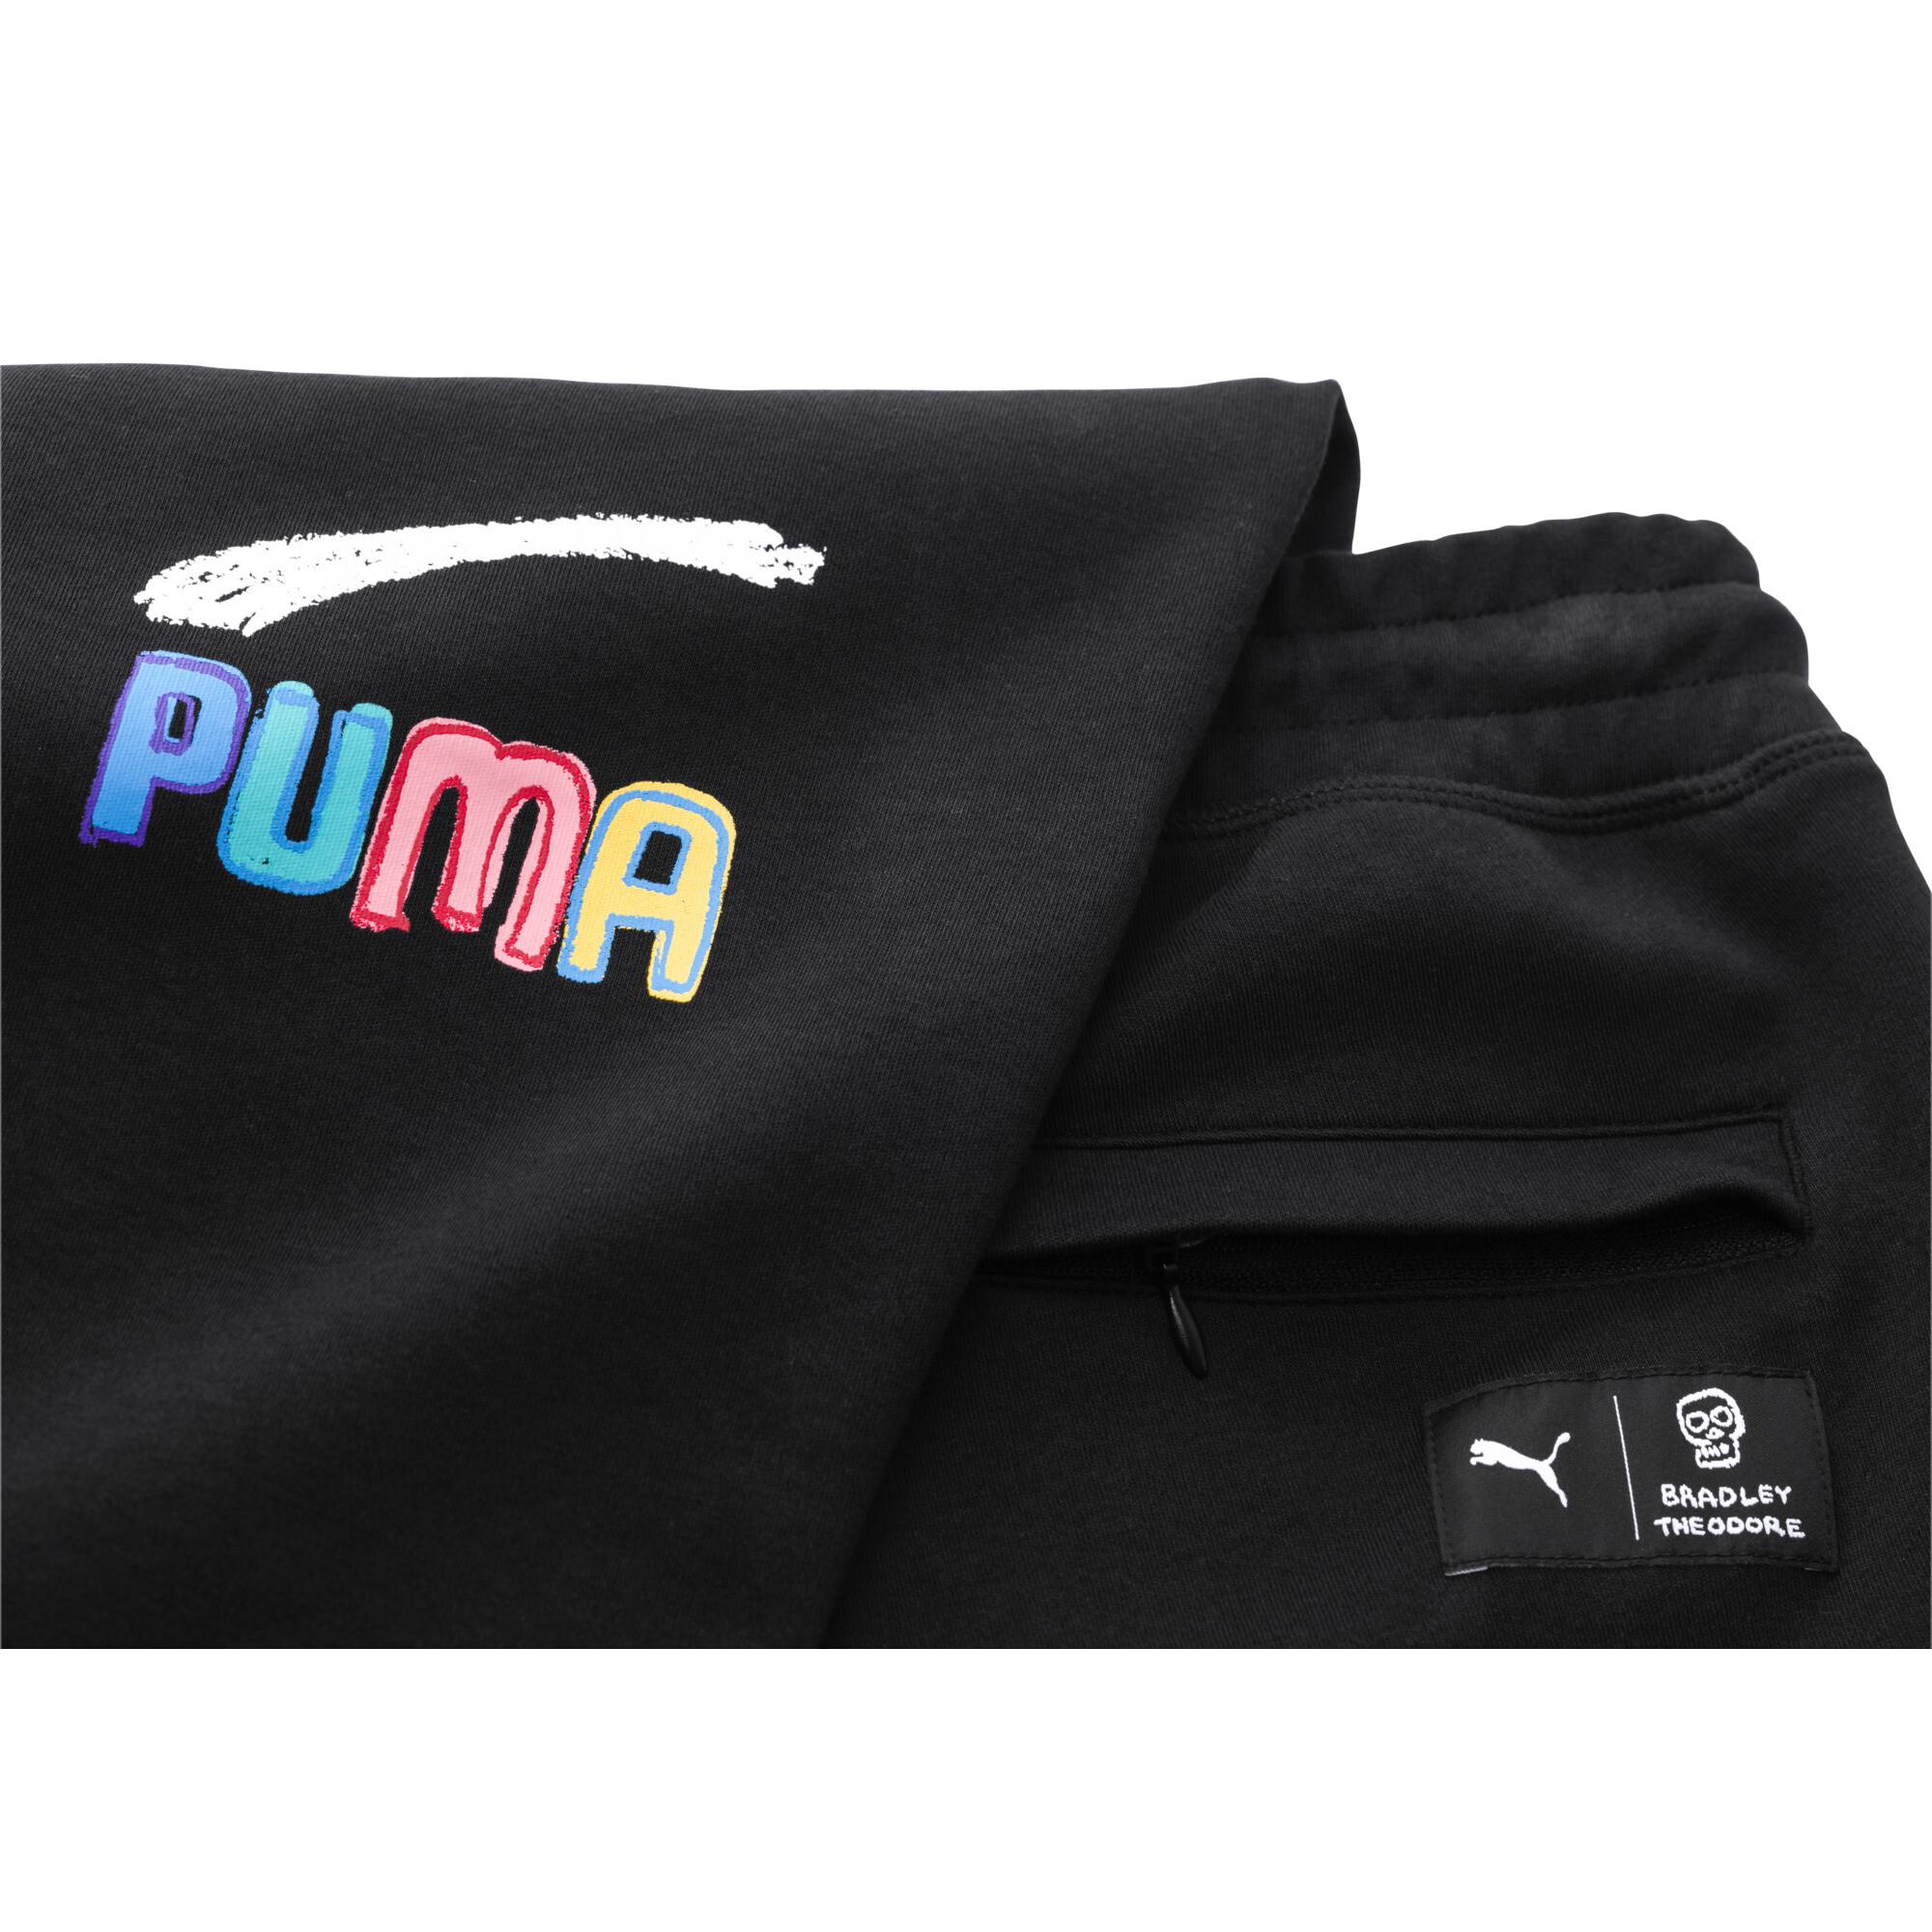 PUMA x BT Track Pants